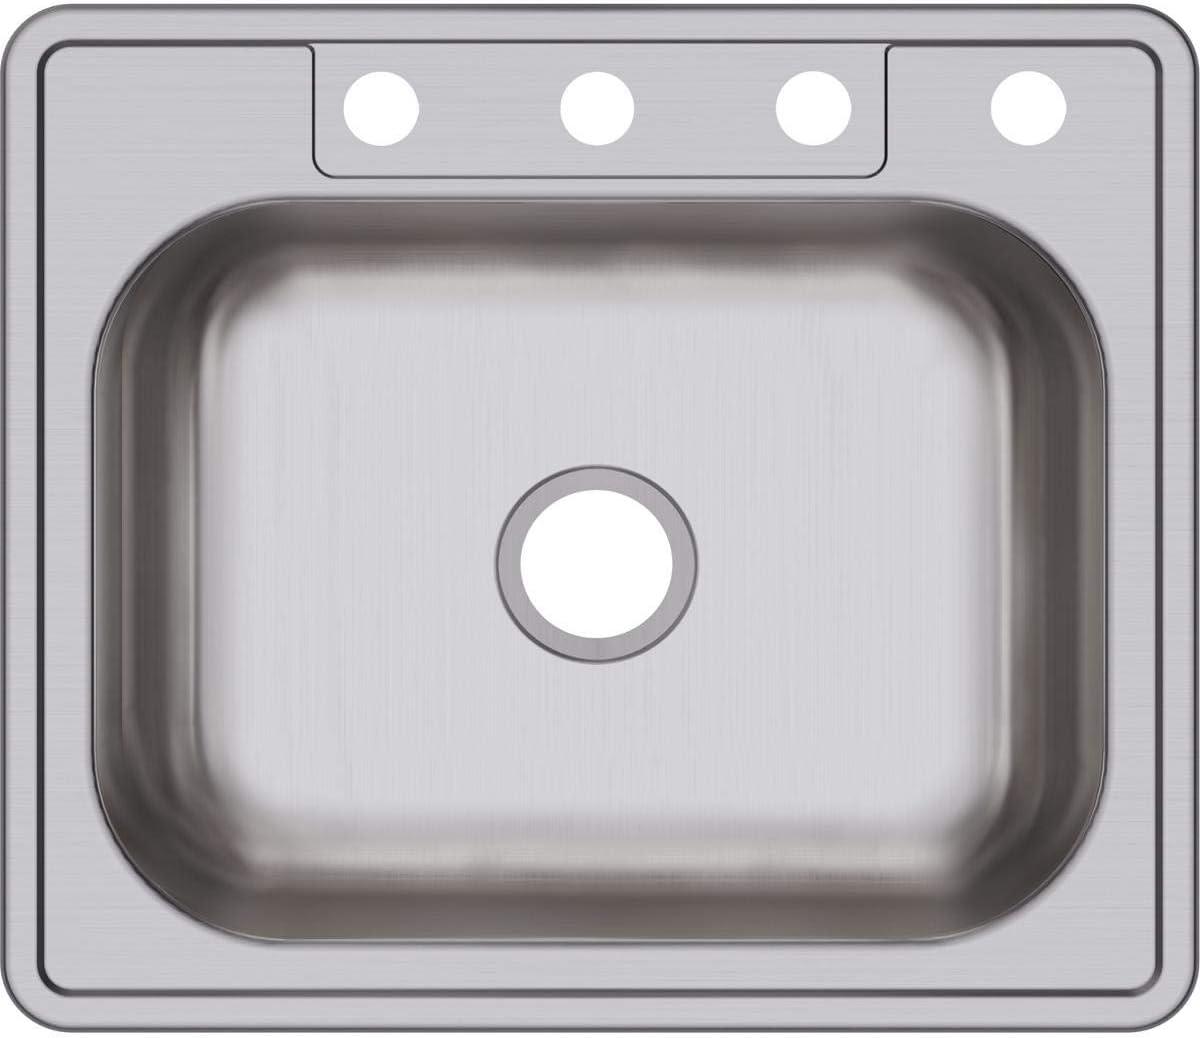 Elkay D125214 Dayton Single Bowl Drop-in Stainless Steel Sink